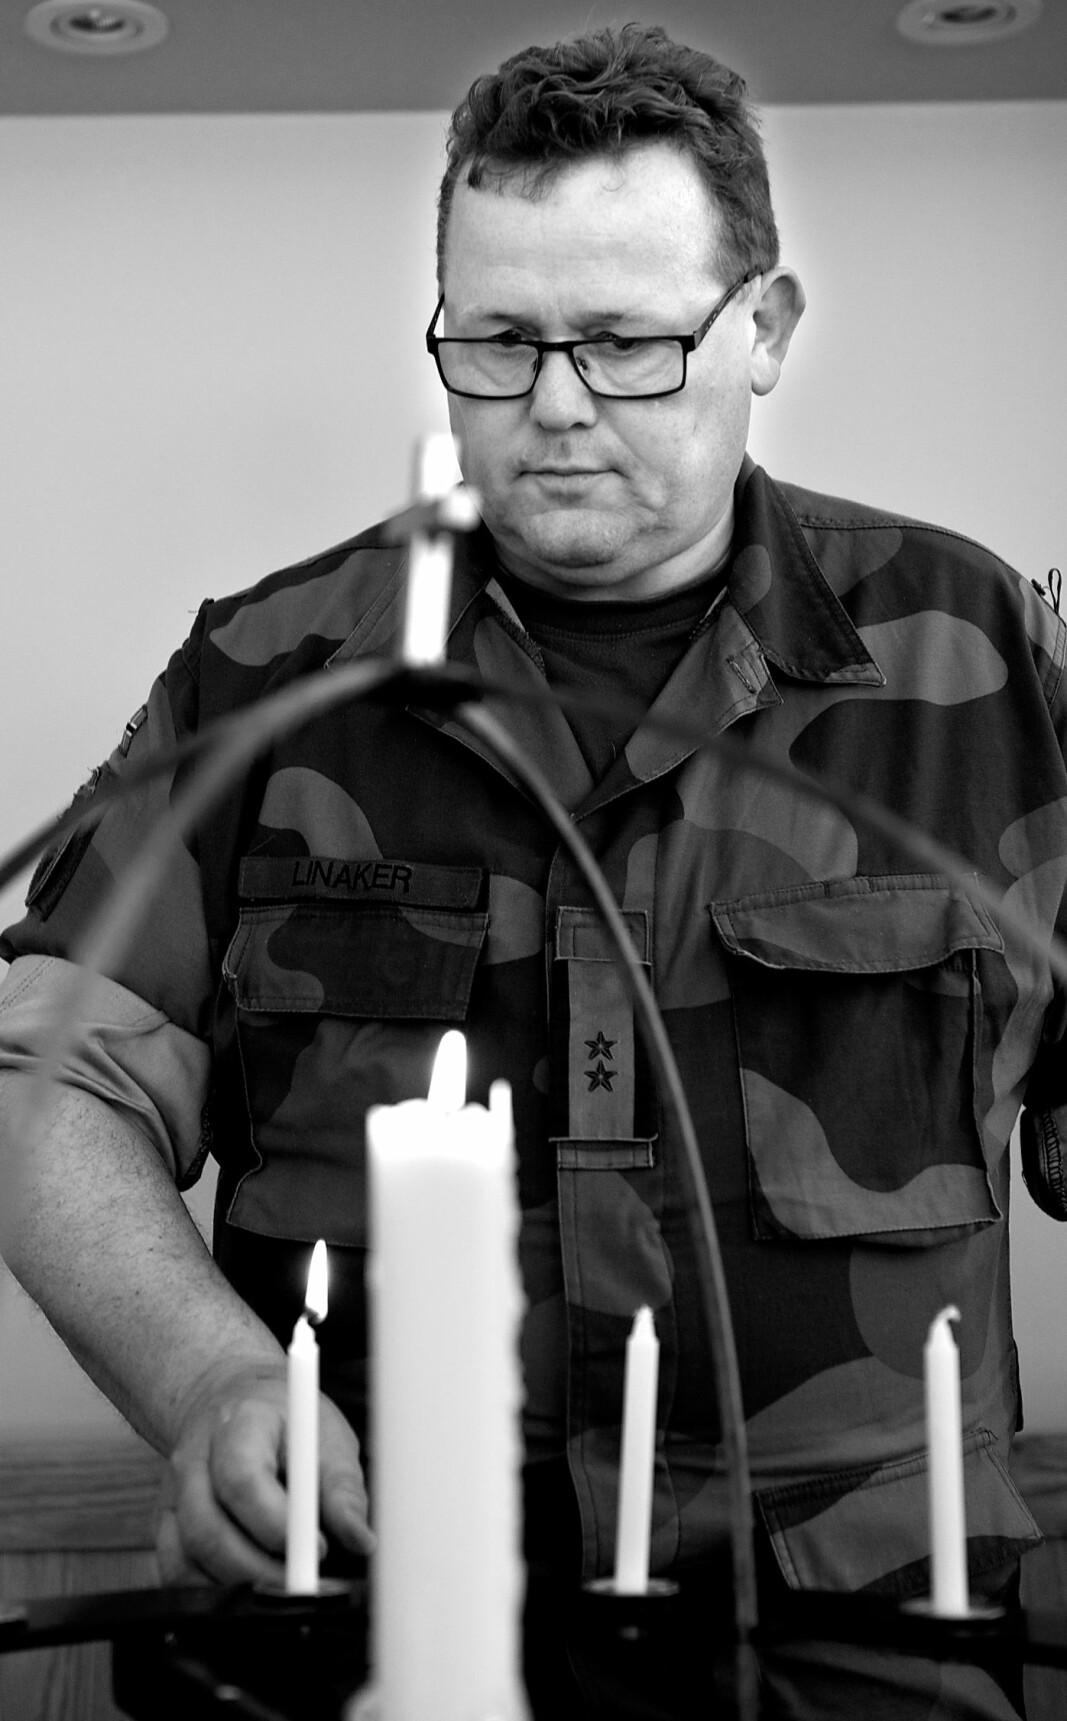 Roald Linaker mistet sønnen sin i Utøya-tragedien.